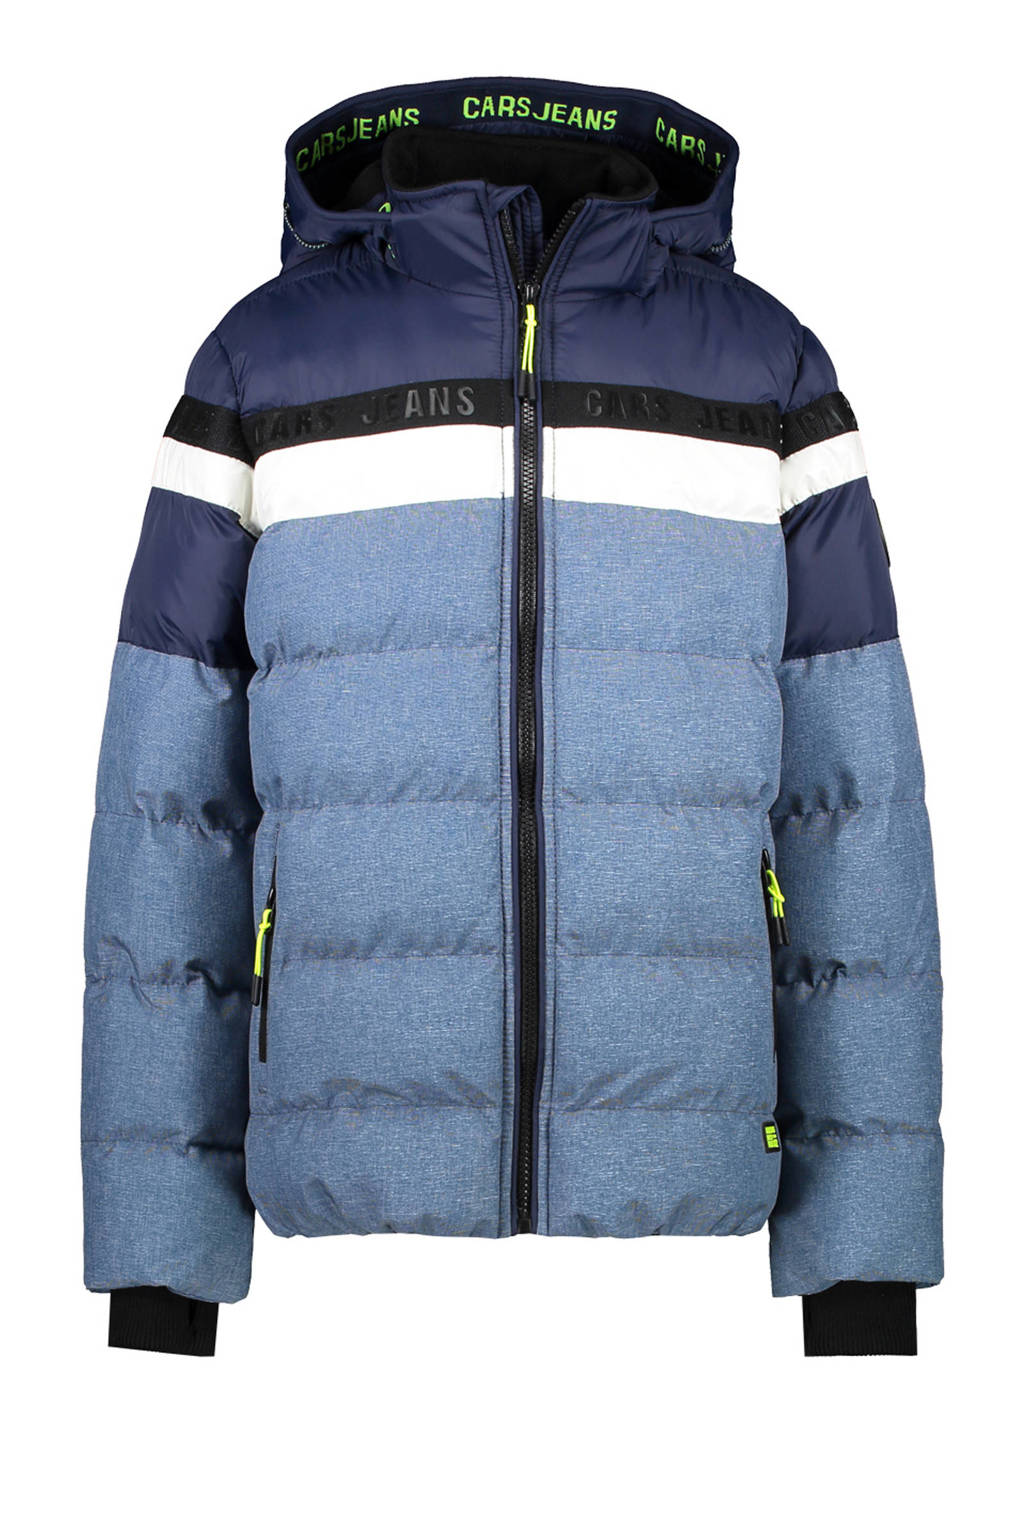 Cars gewatteerde winterjas Byram lichtblauw/donkerblauw/wit, Lichtblauw/donkerblauw/wit